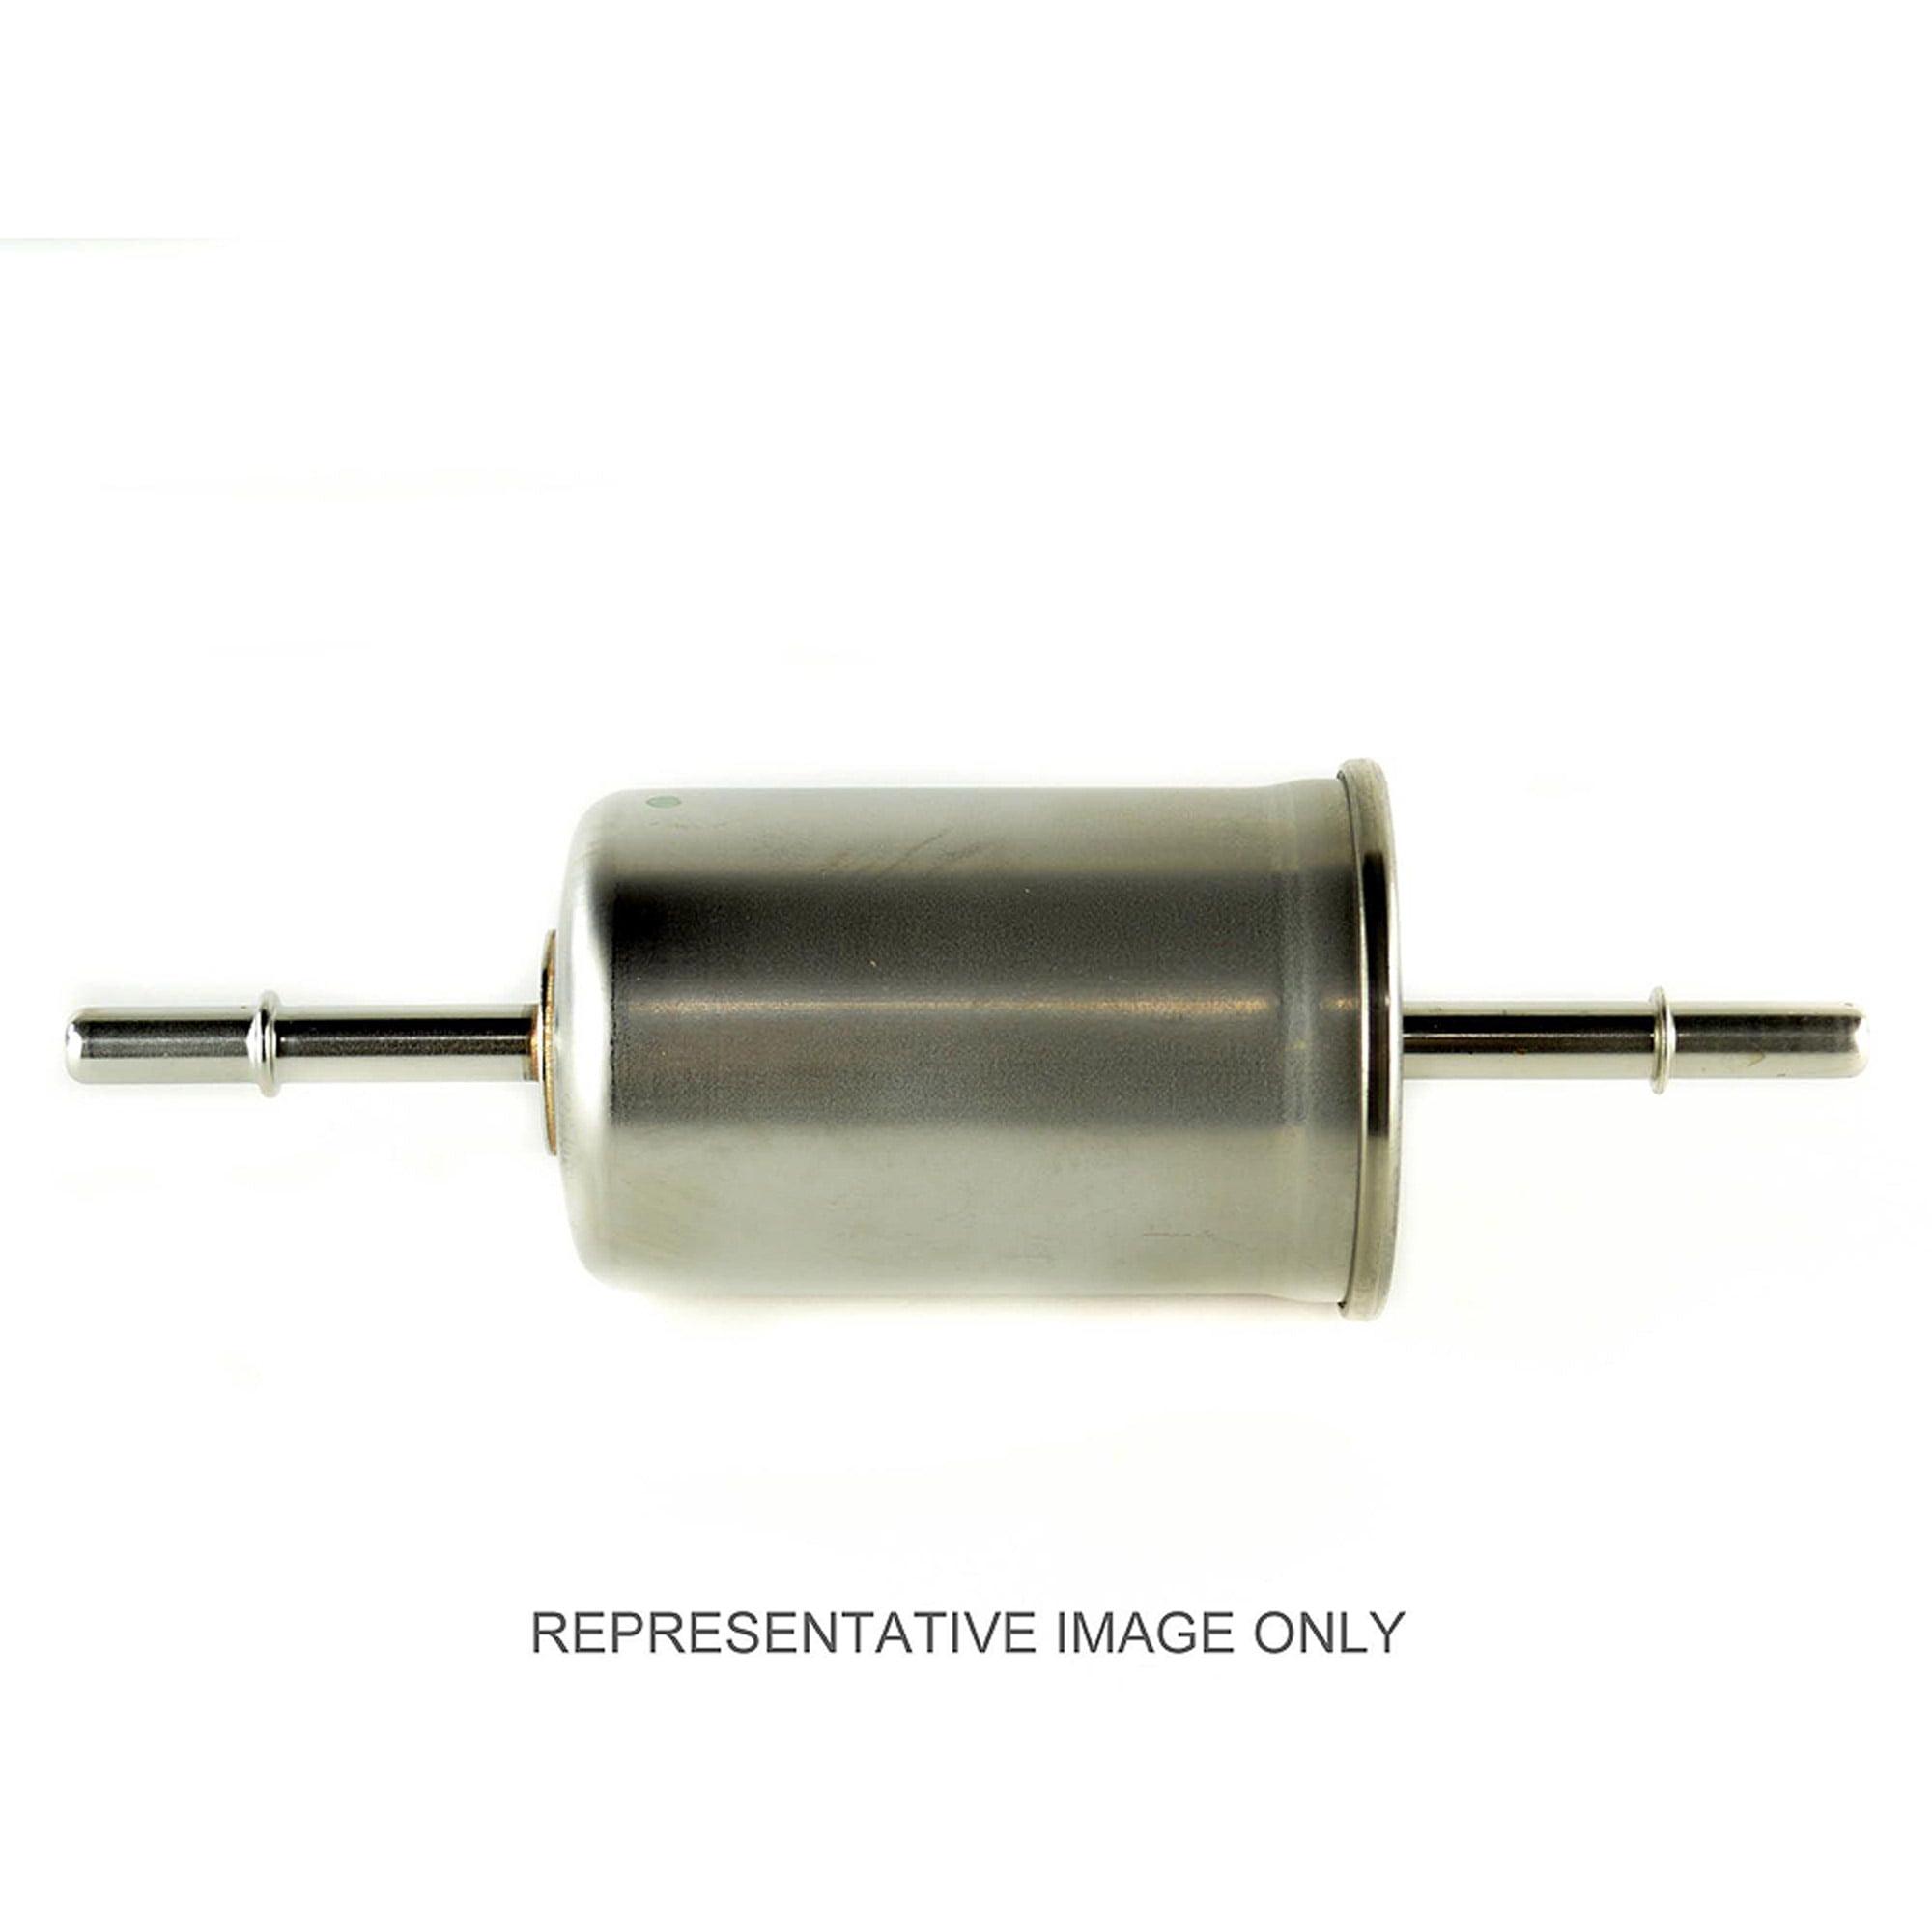 Motorcraft Engine Fuel Filter, MTCFG1083